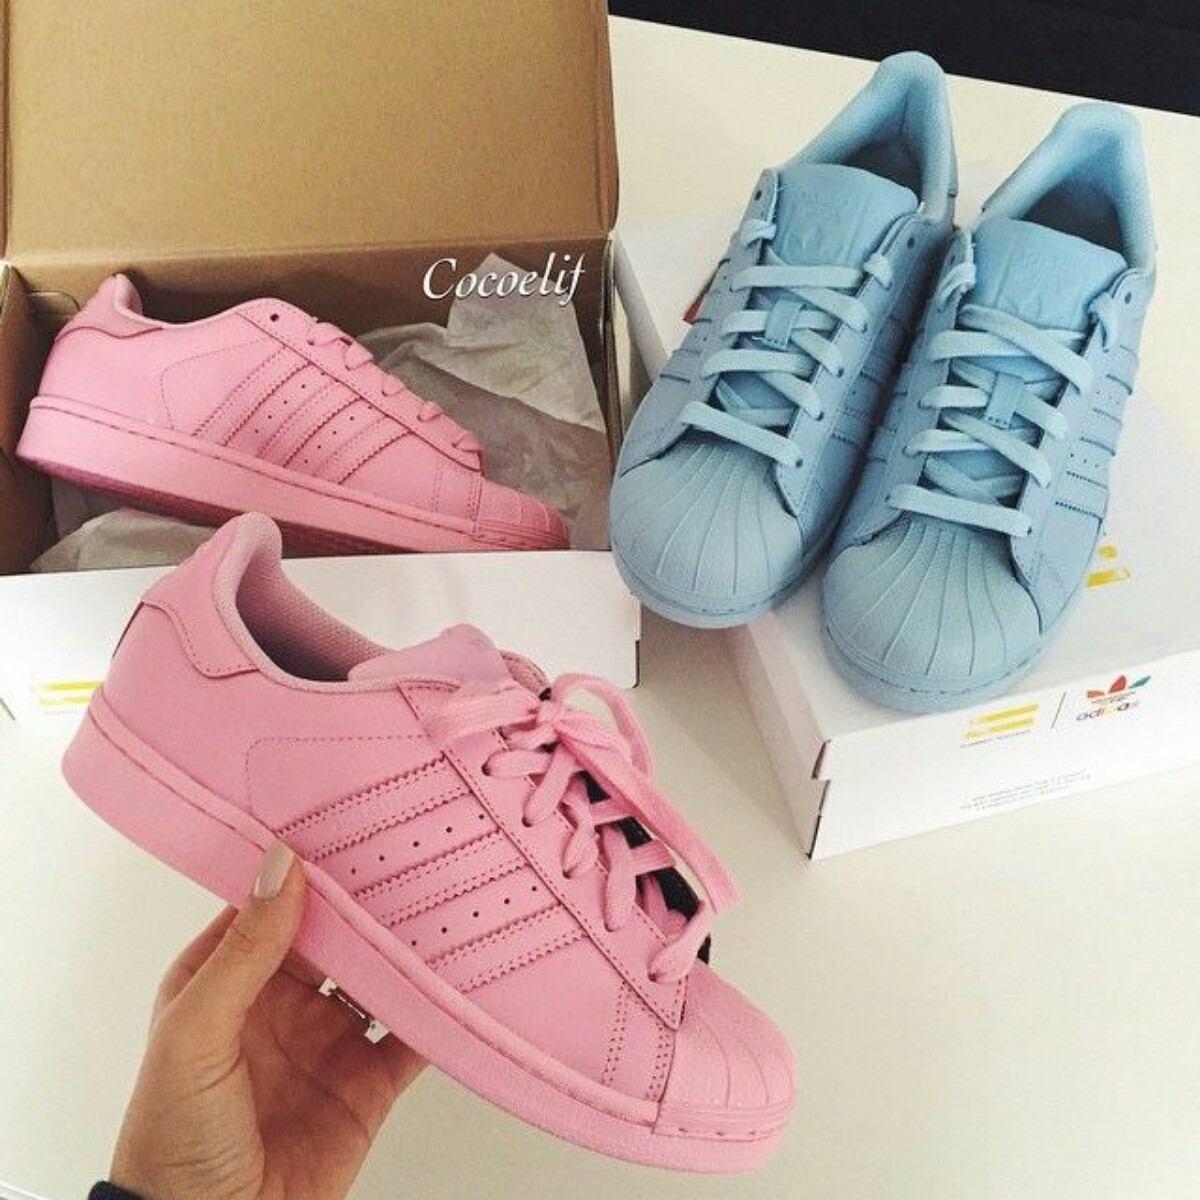 883561ae756 ireland adidas superstar colors rosa a4599 593b7